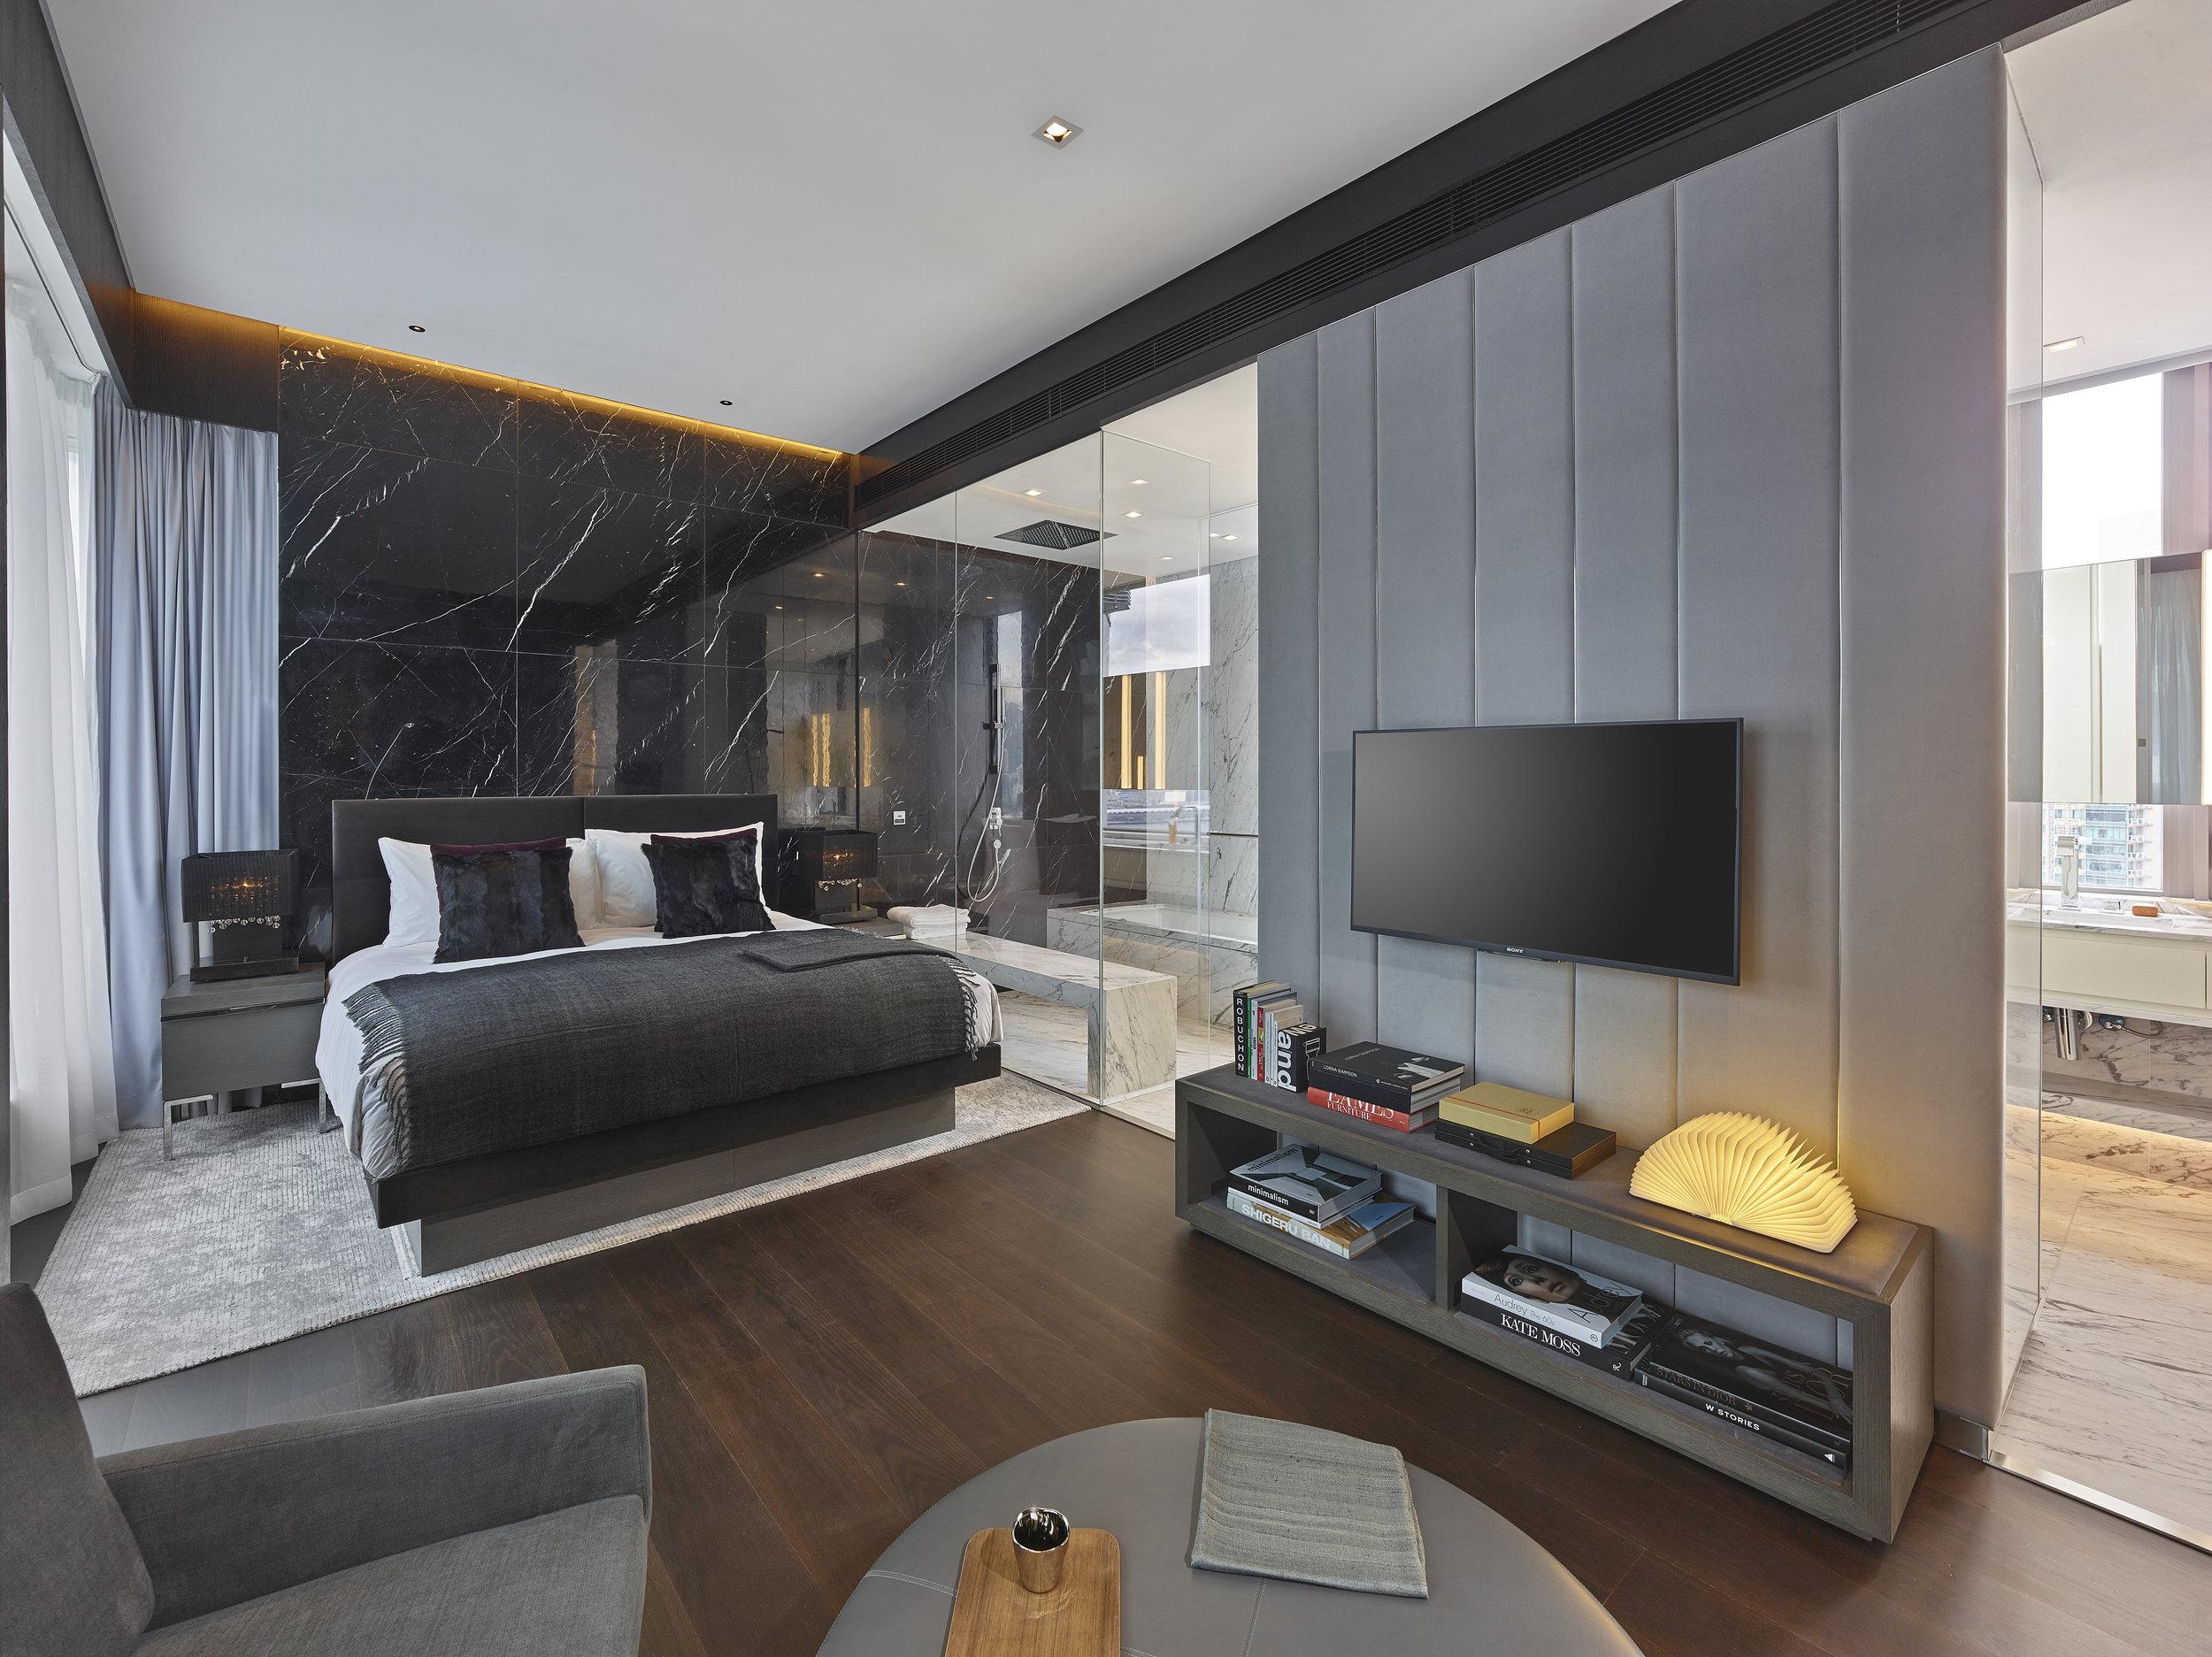 Penthouse A Master.jpg